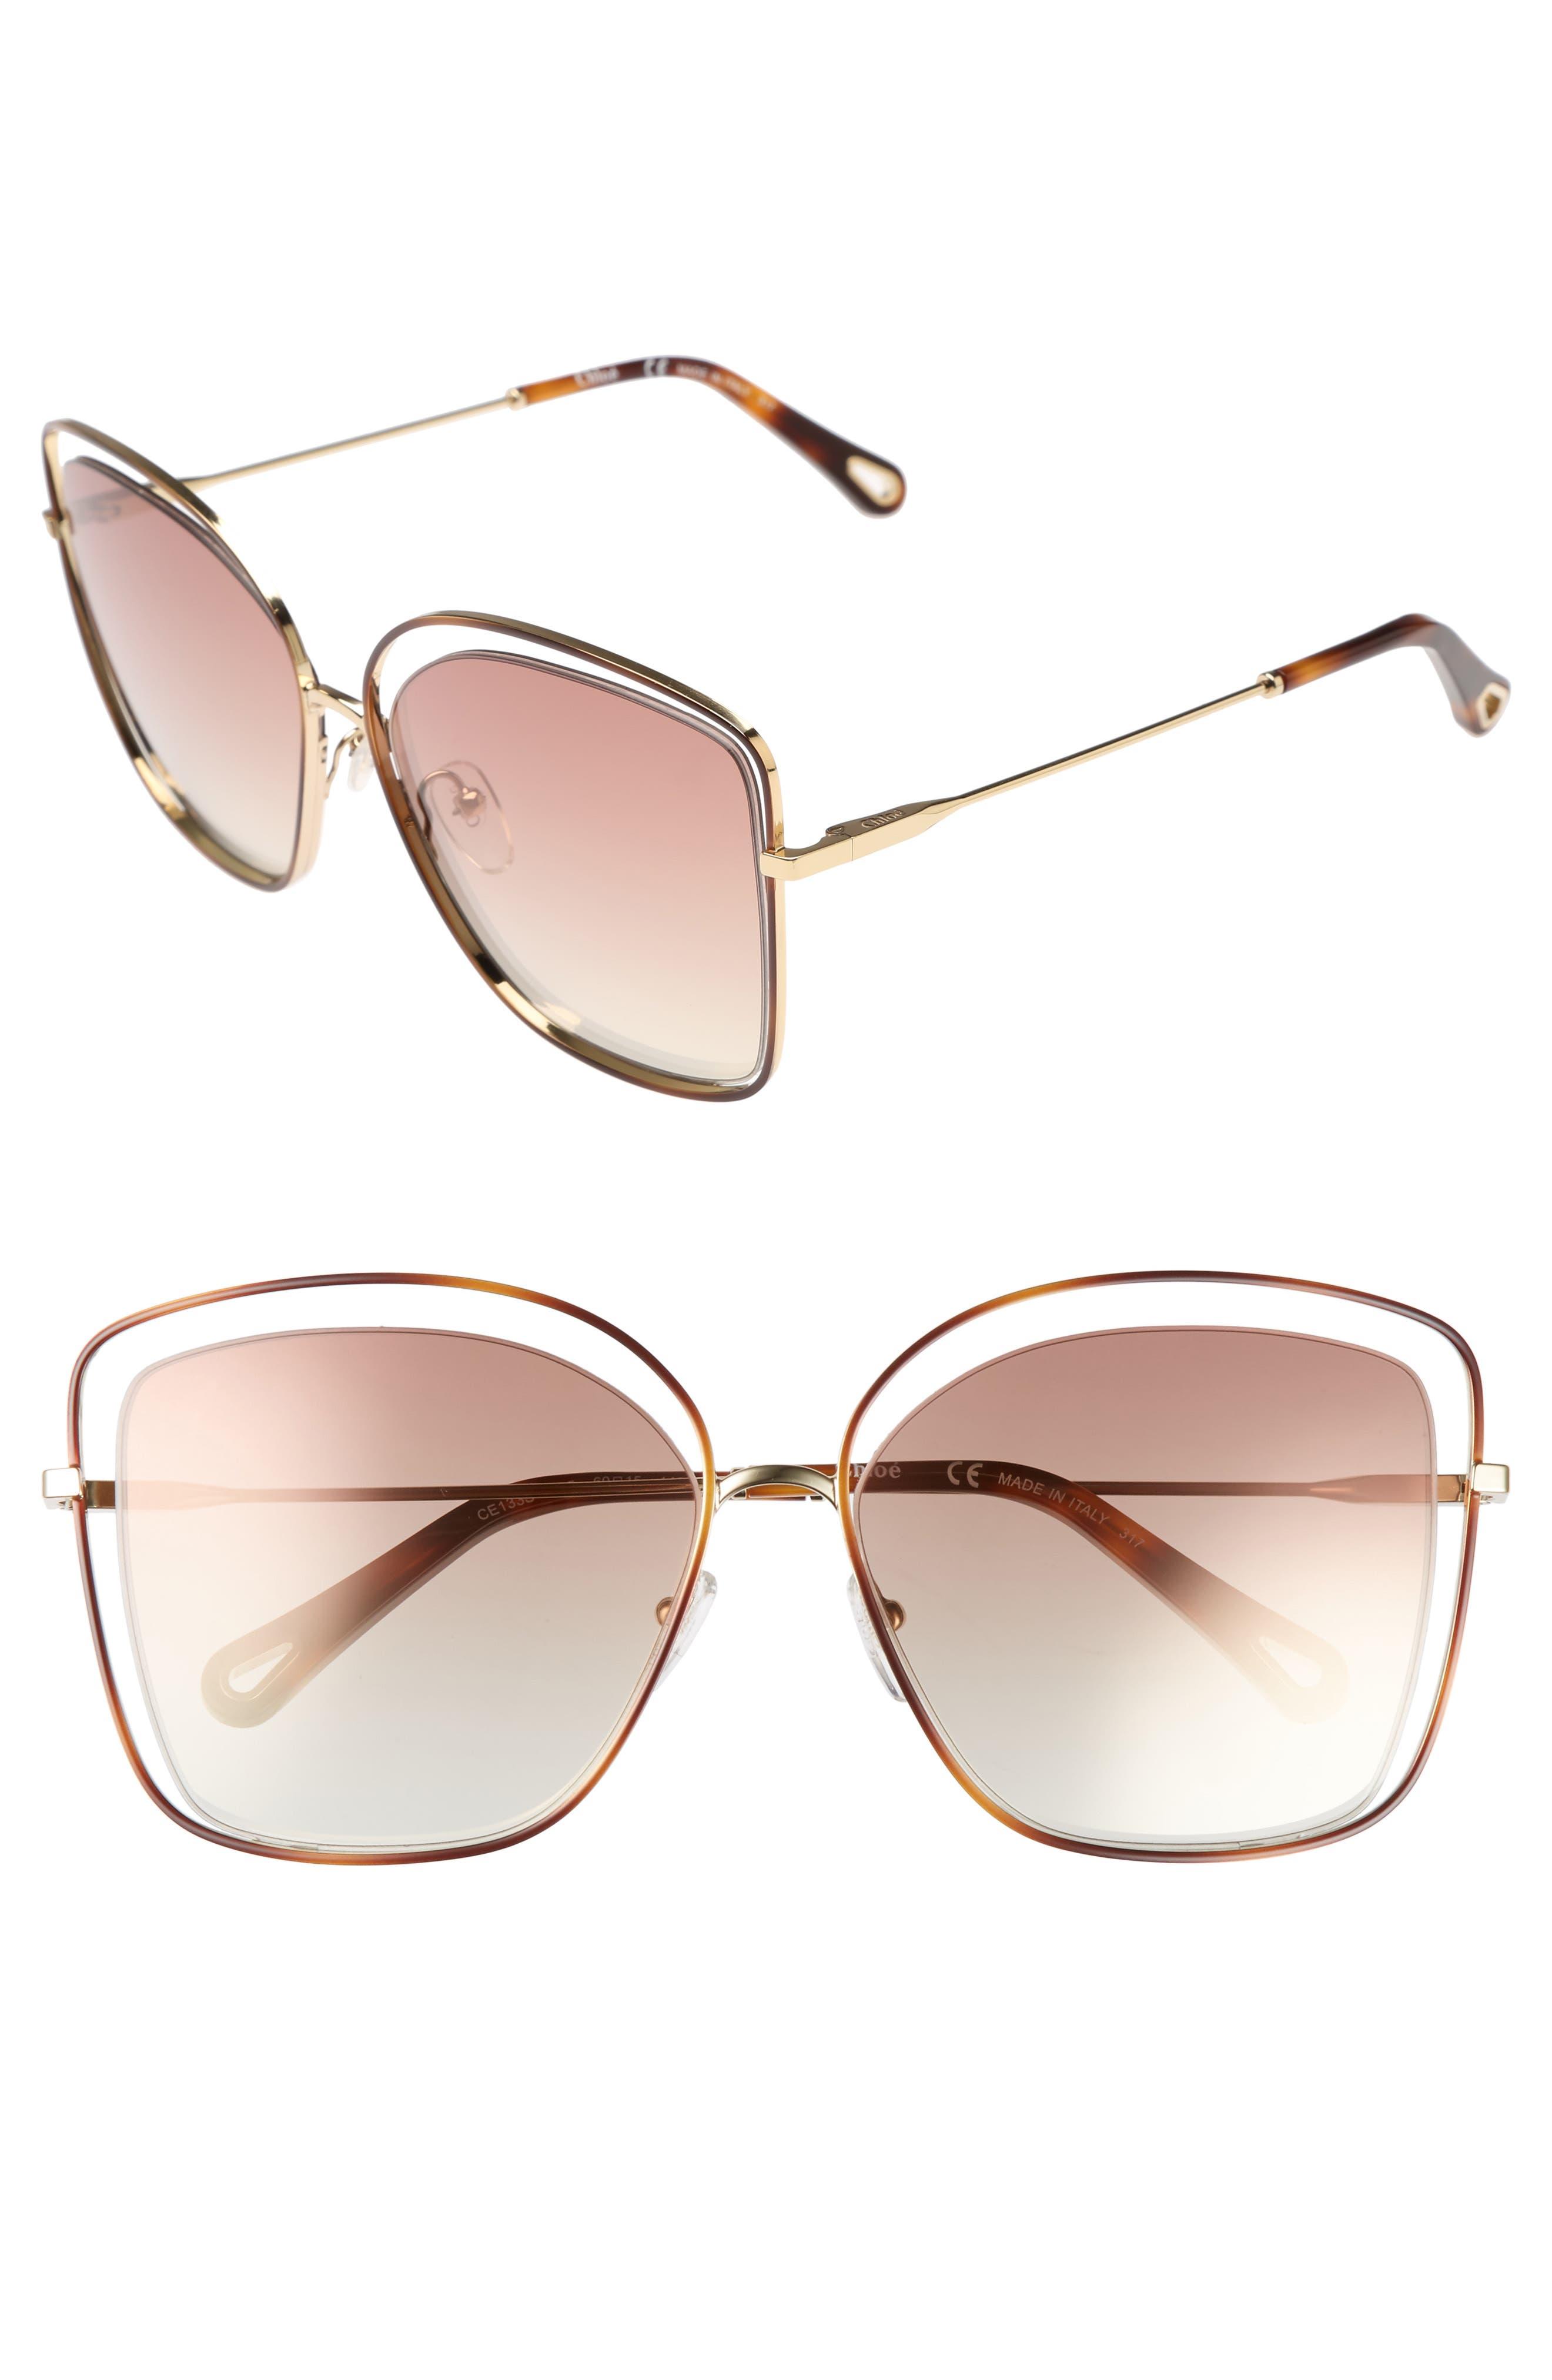 60mm Halo Frame Sunglasses,                         Main,                         color, Havana/ Bronze